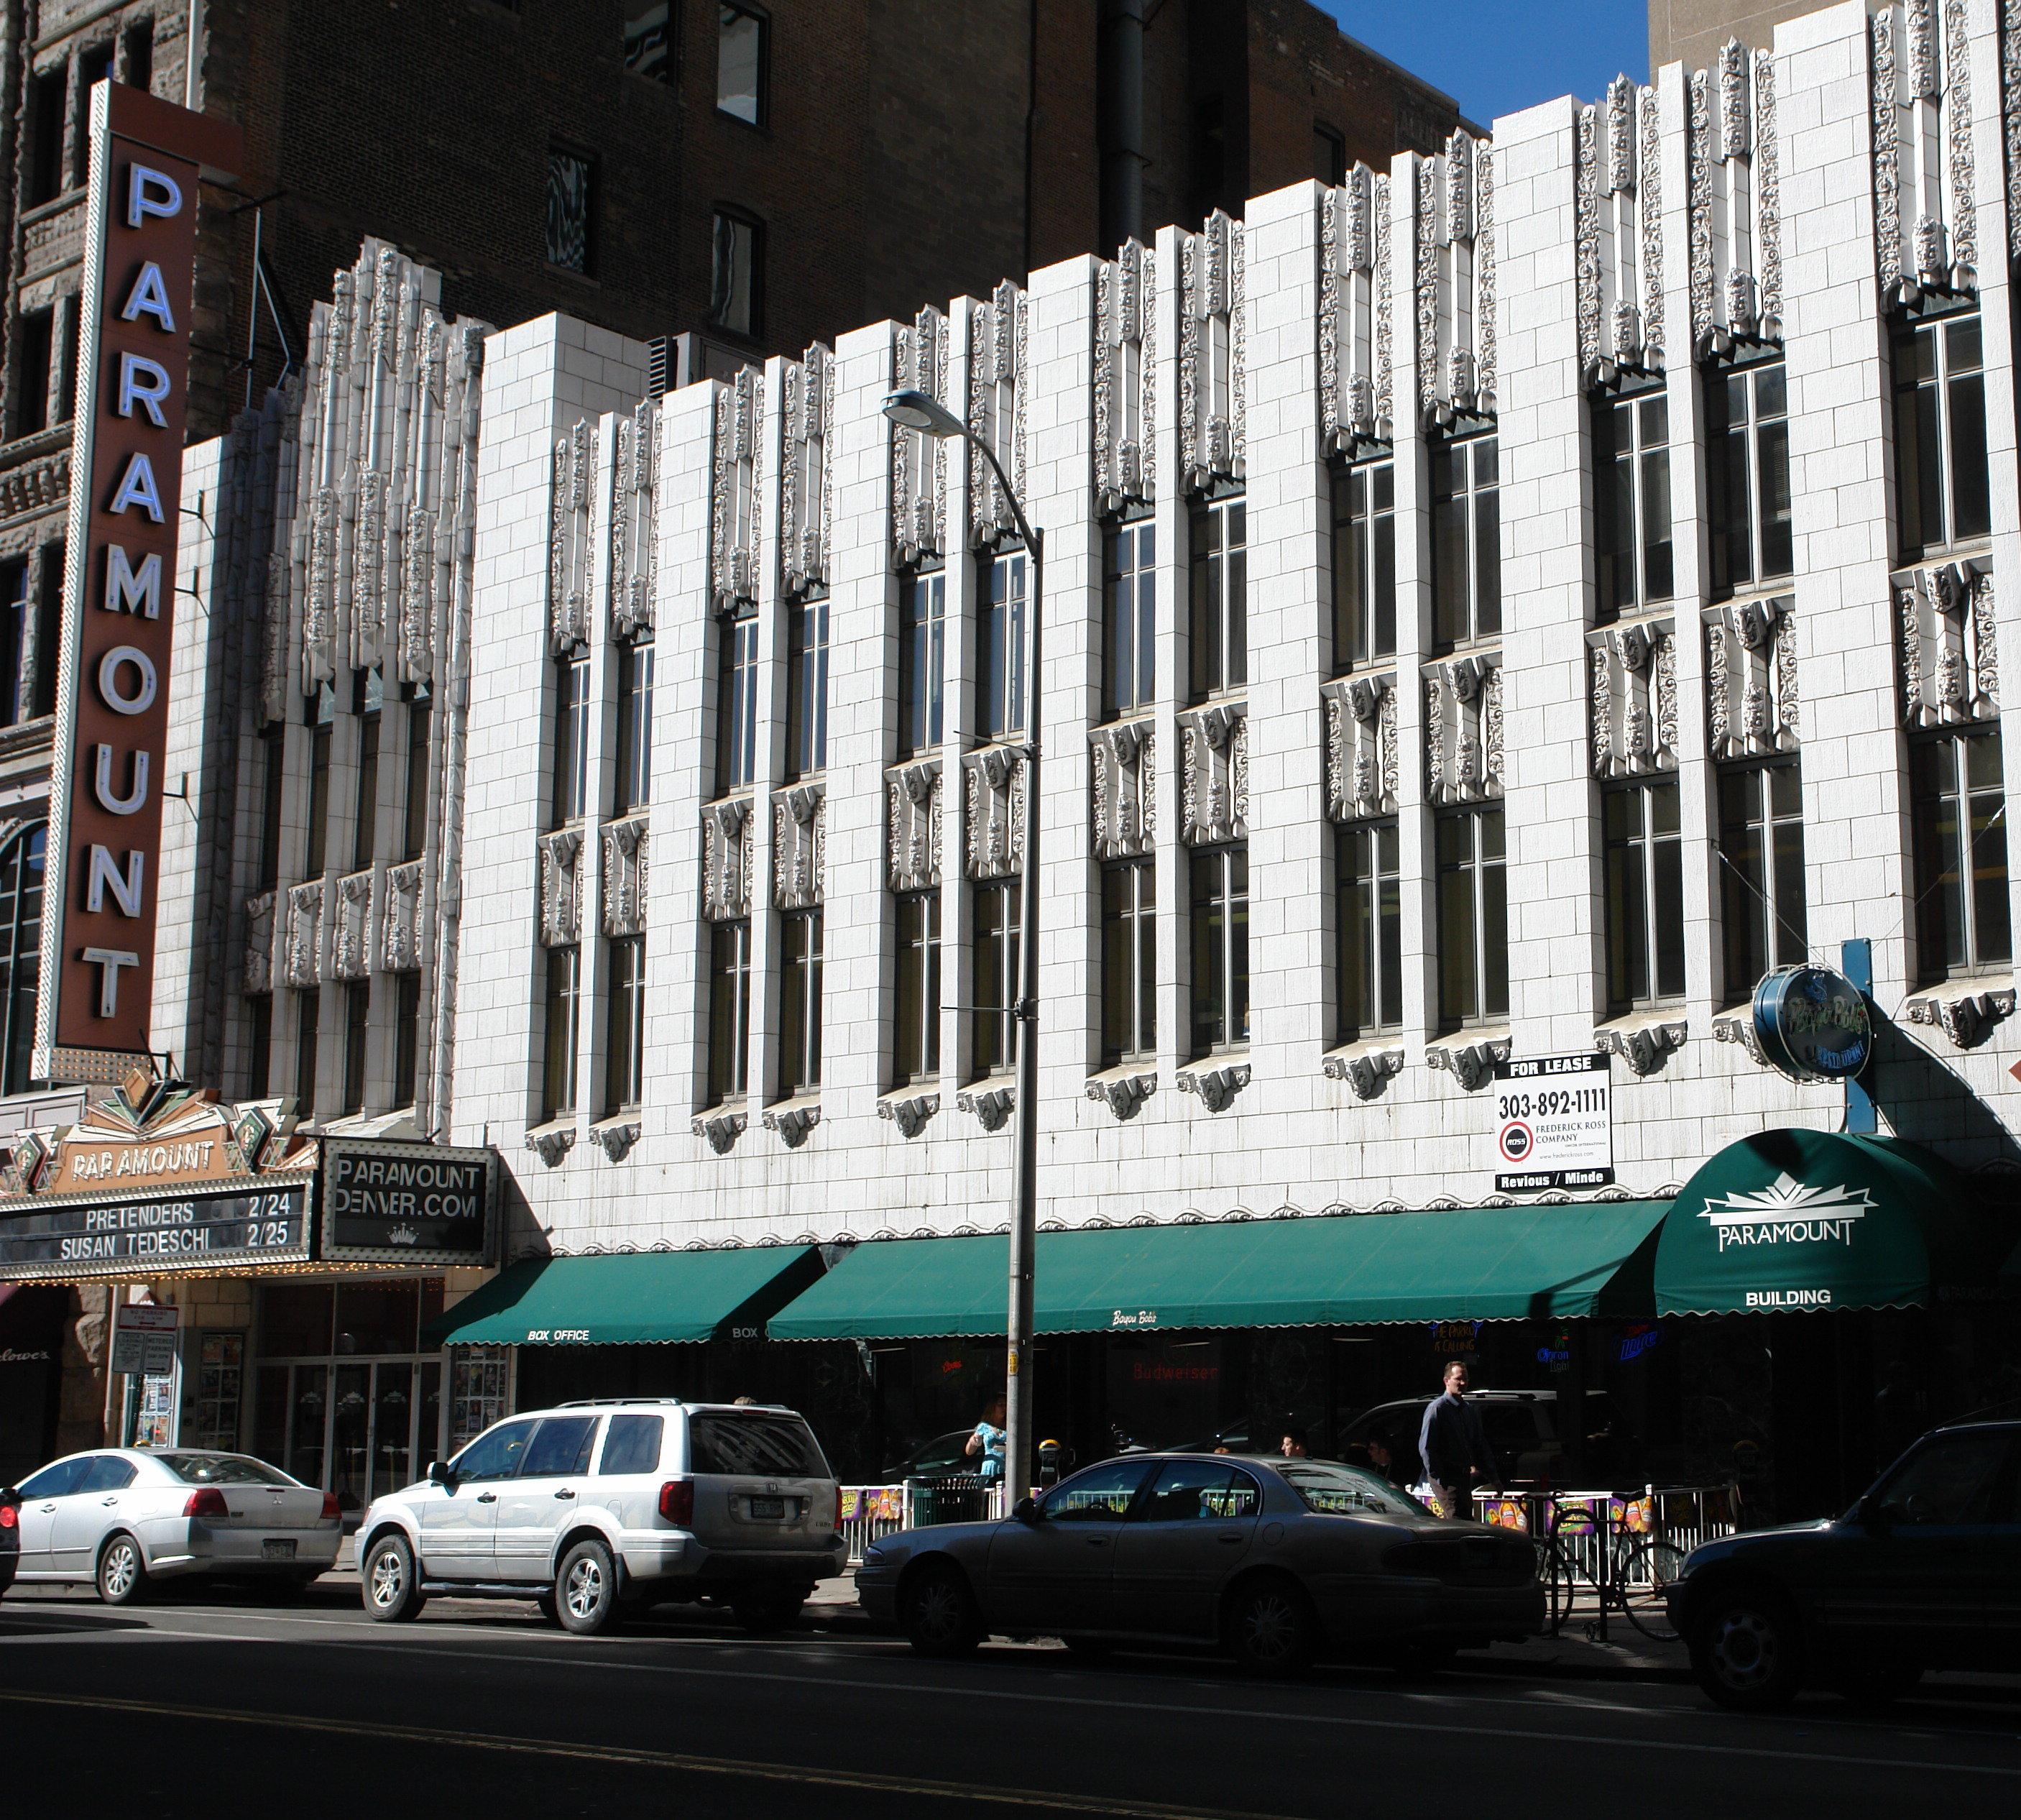 Paramount_Theater_Denver_CO.jpg